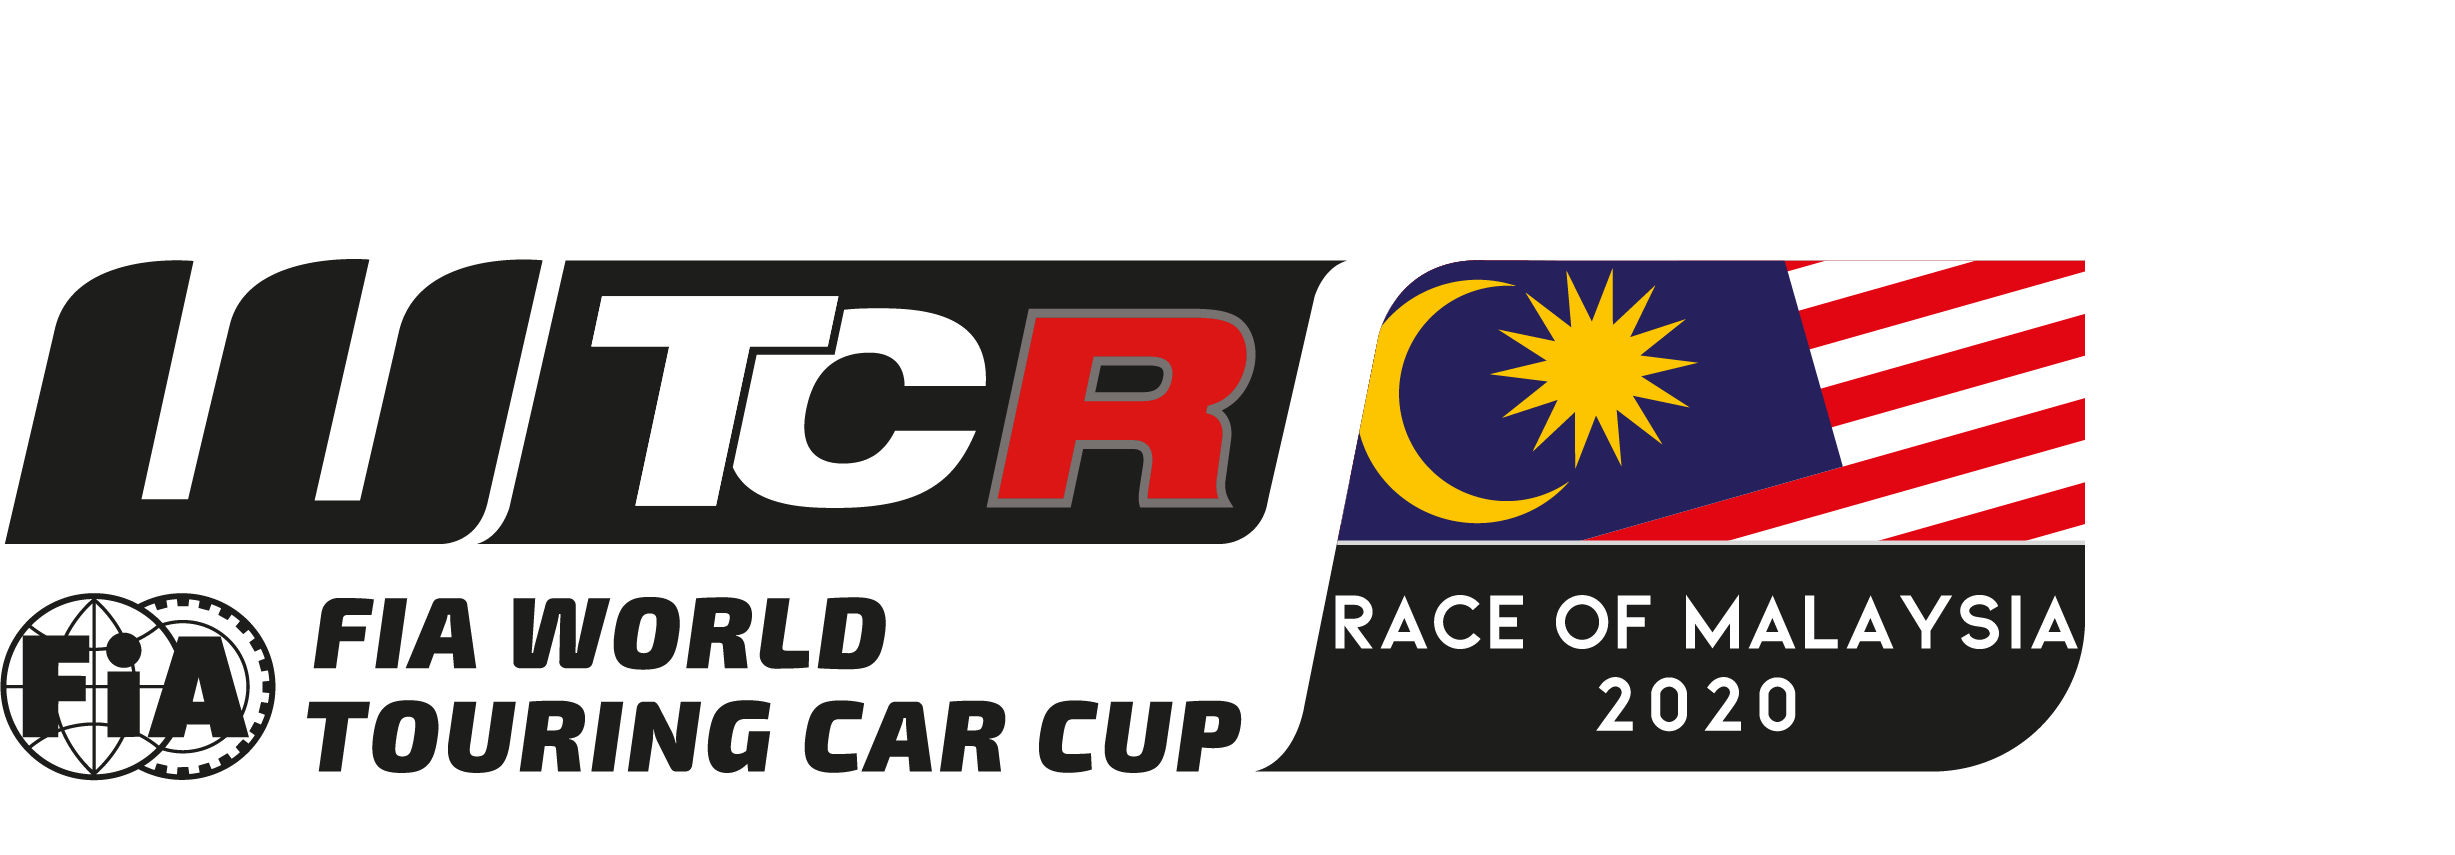 Race of Malaysia